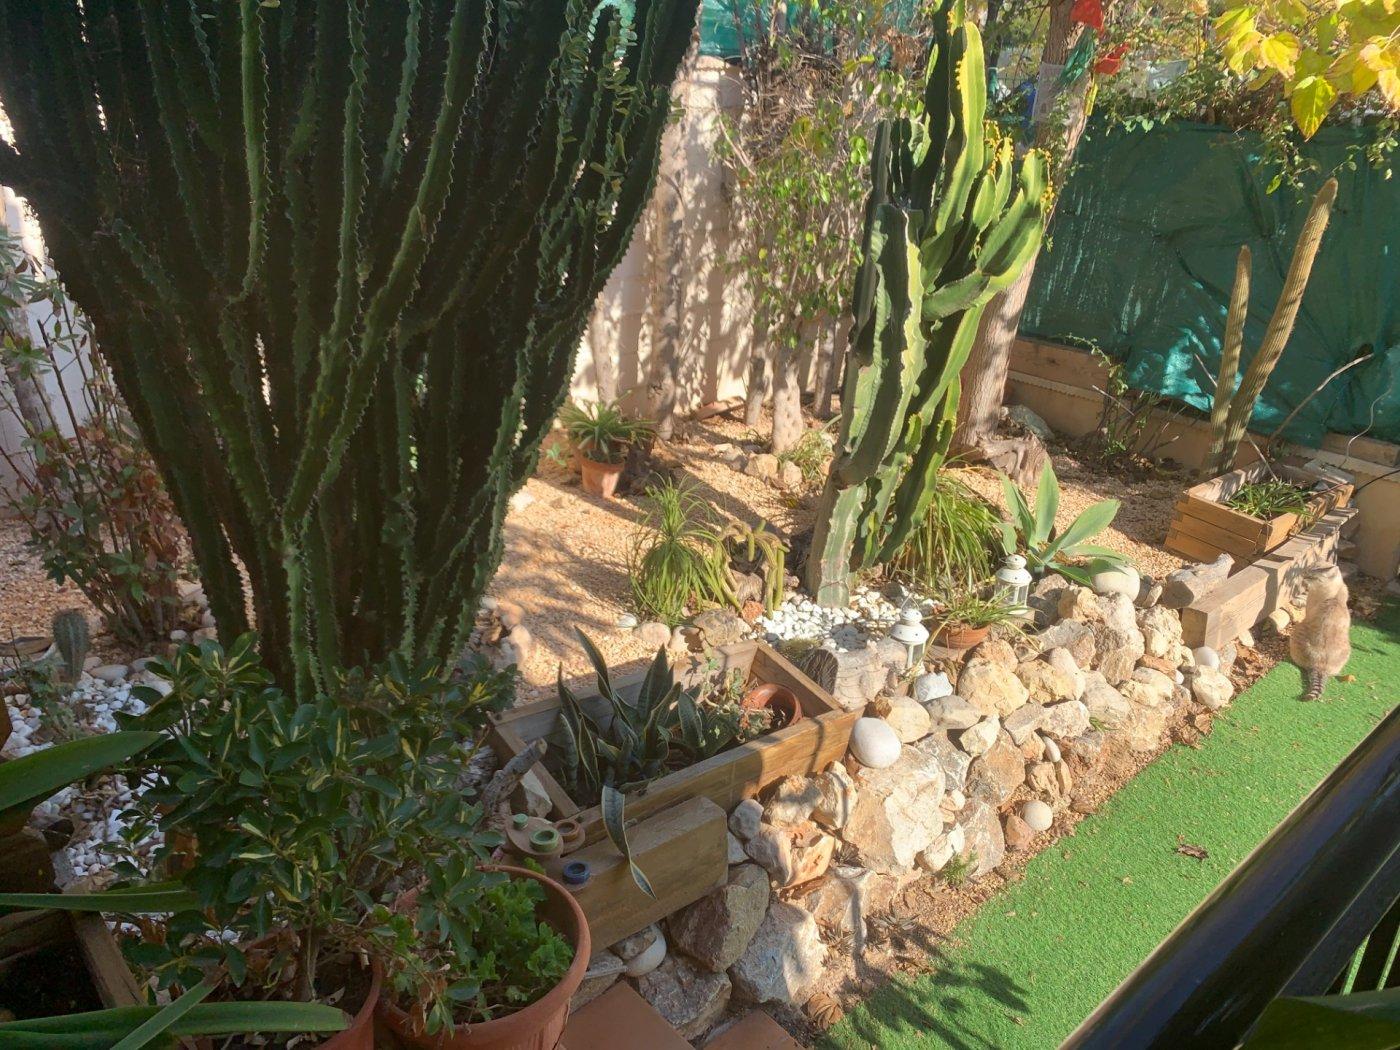 Planta baja adosada con jardin en bonalva - imagenInmueble22